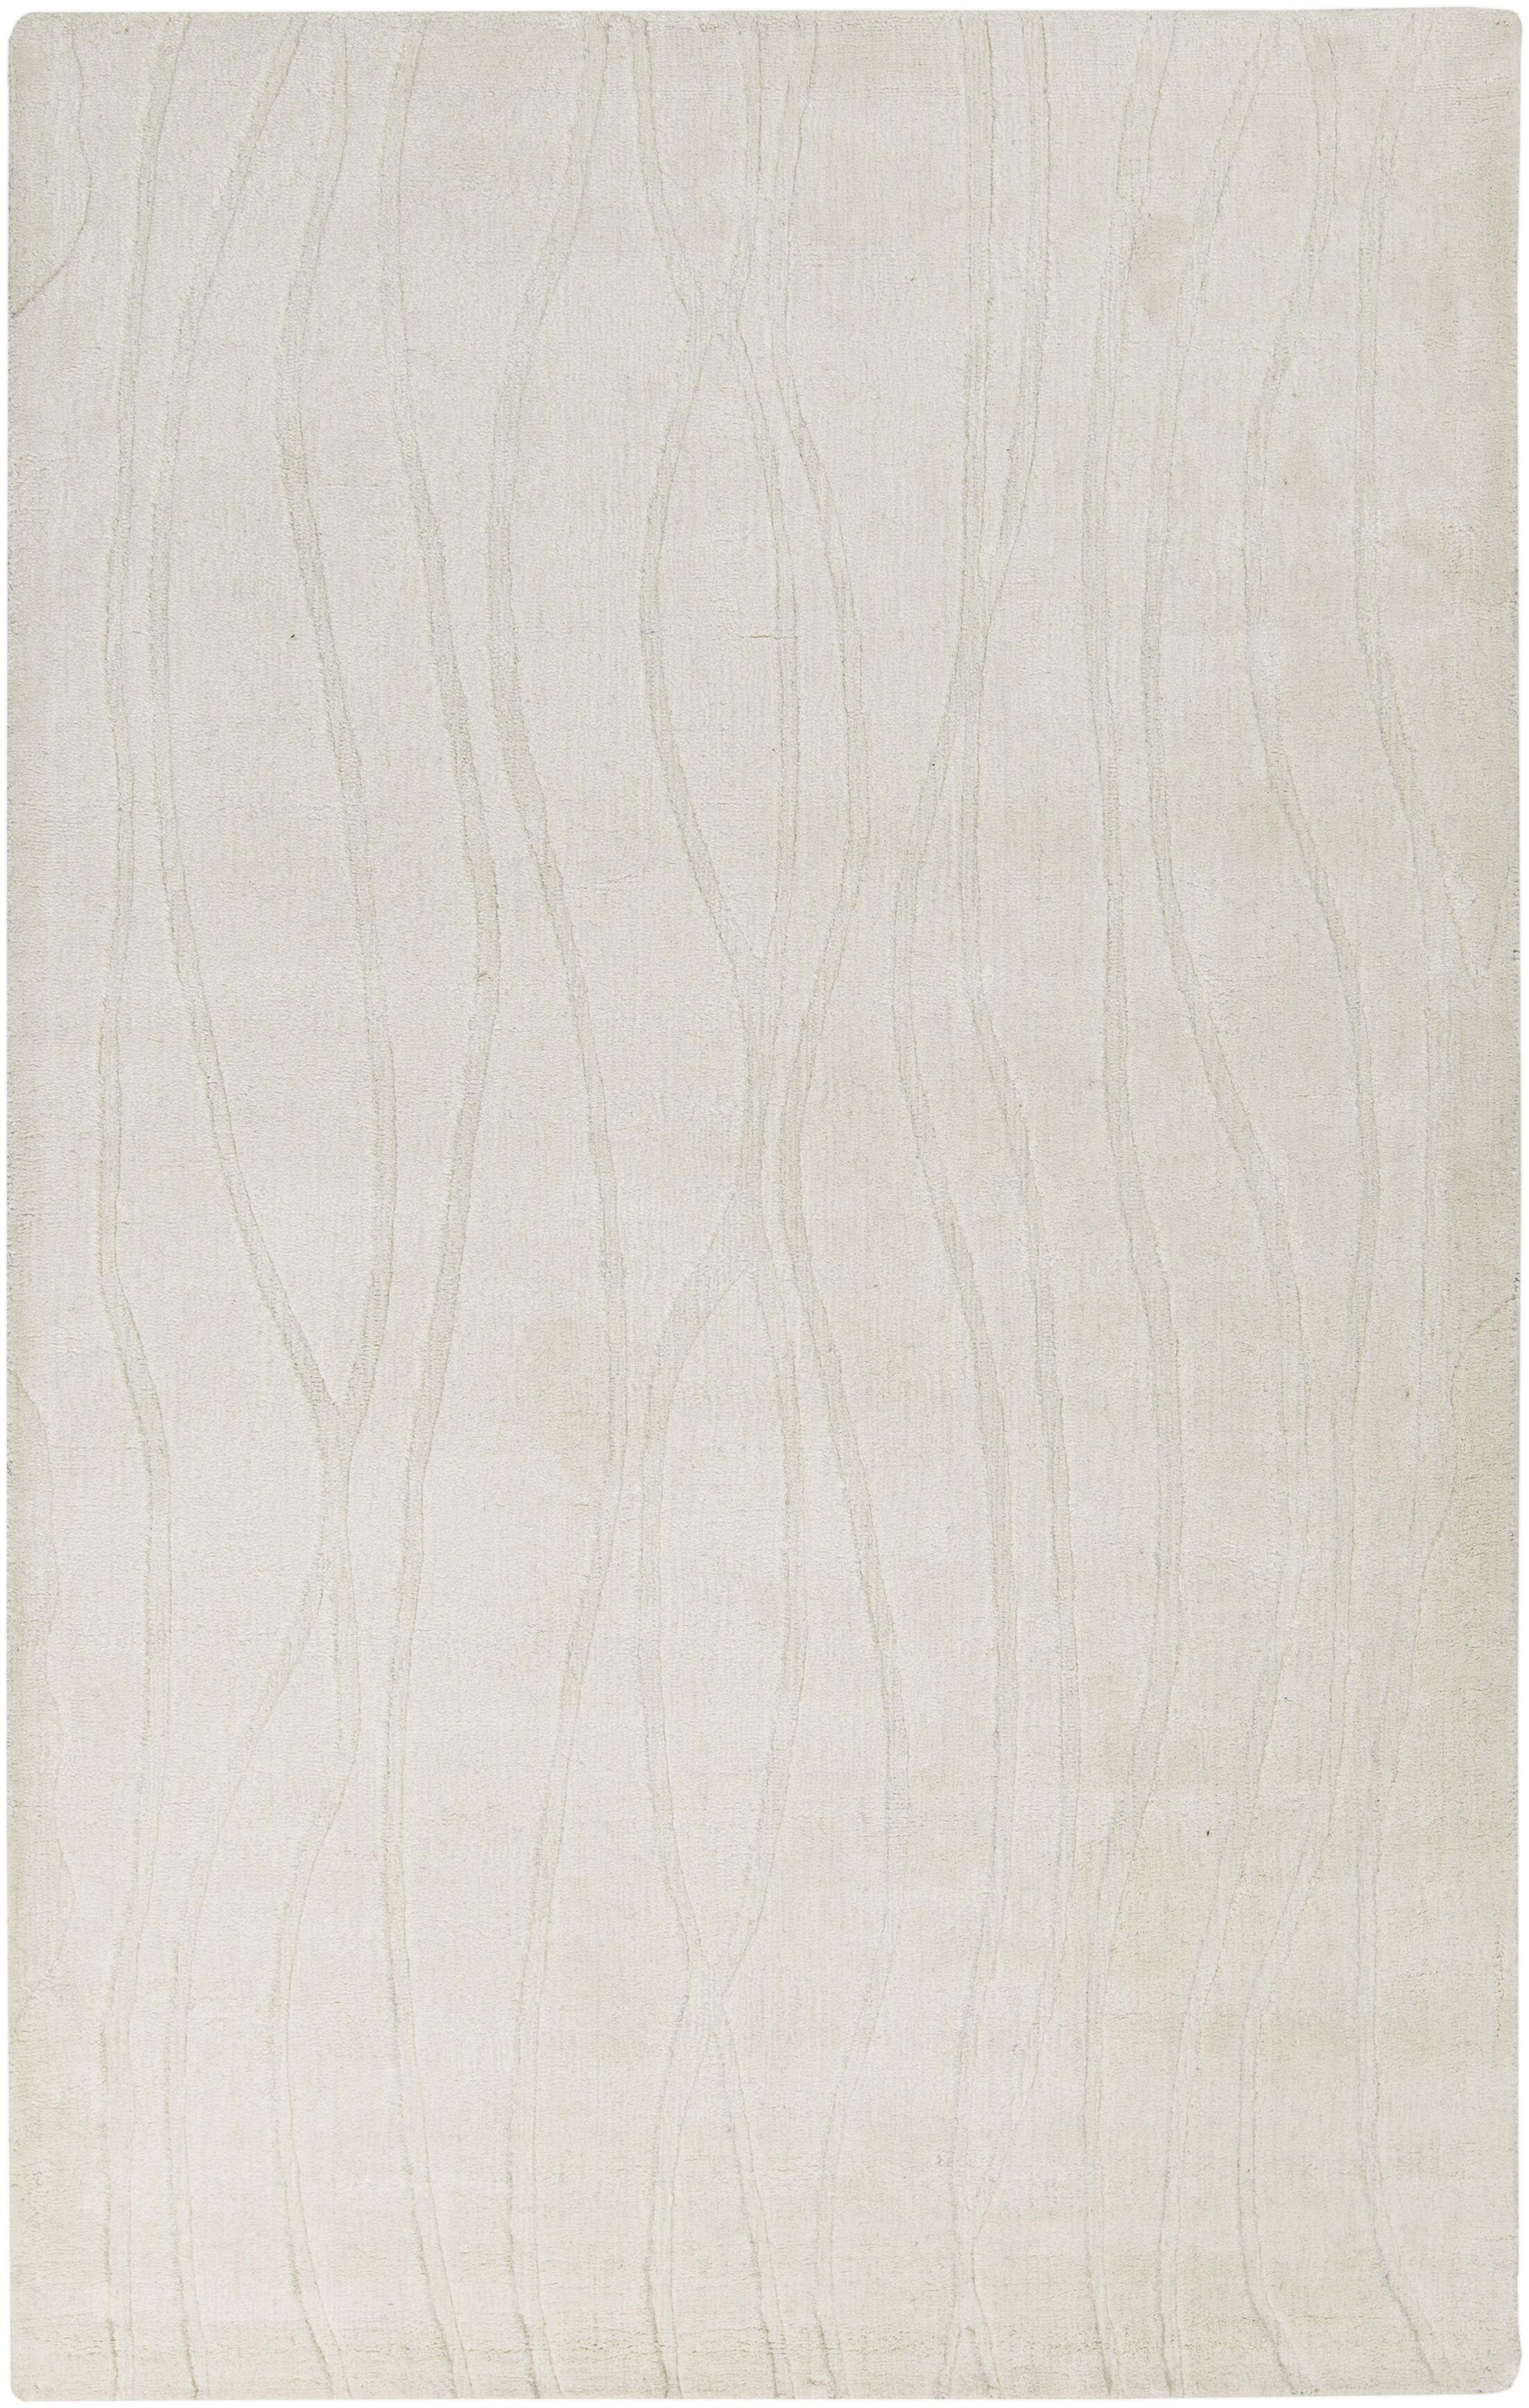 Esma Ivory Area Rug Rug Size: Rectangle 3'3